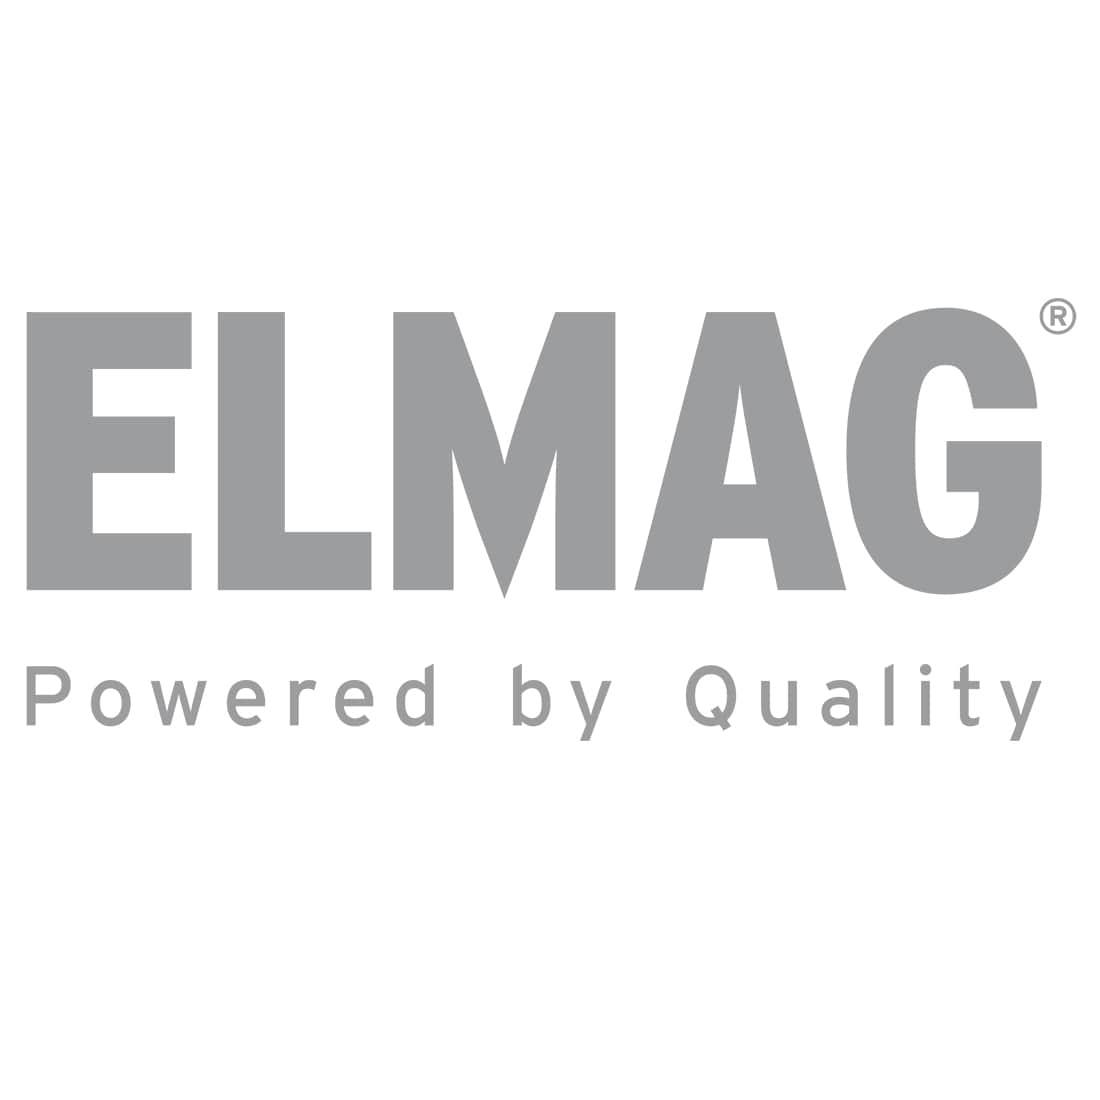 Digital compressed air energy saver